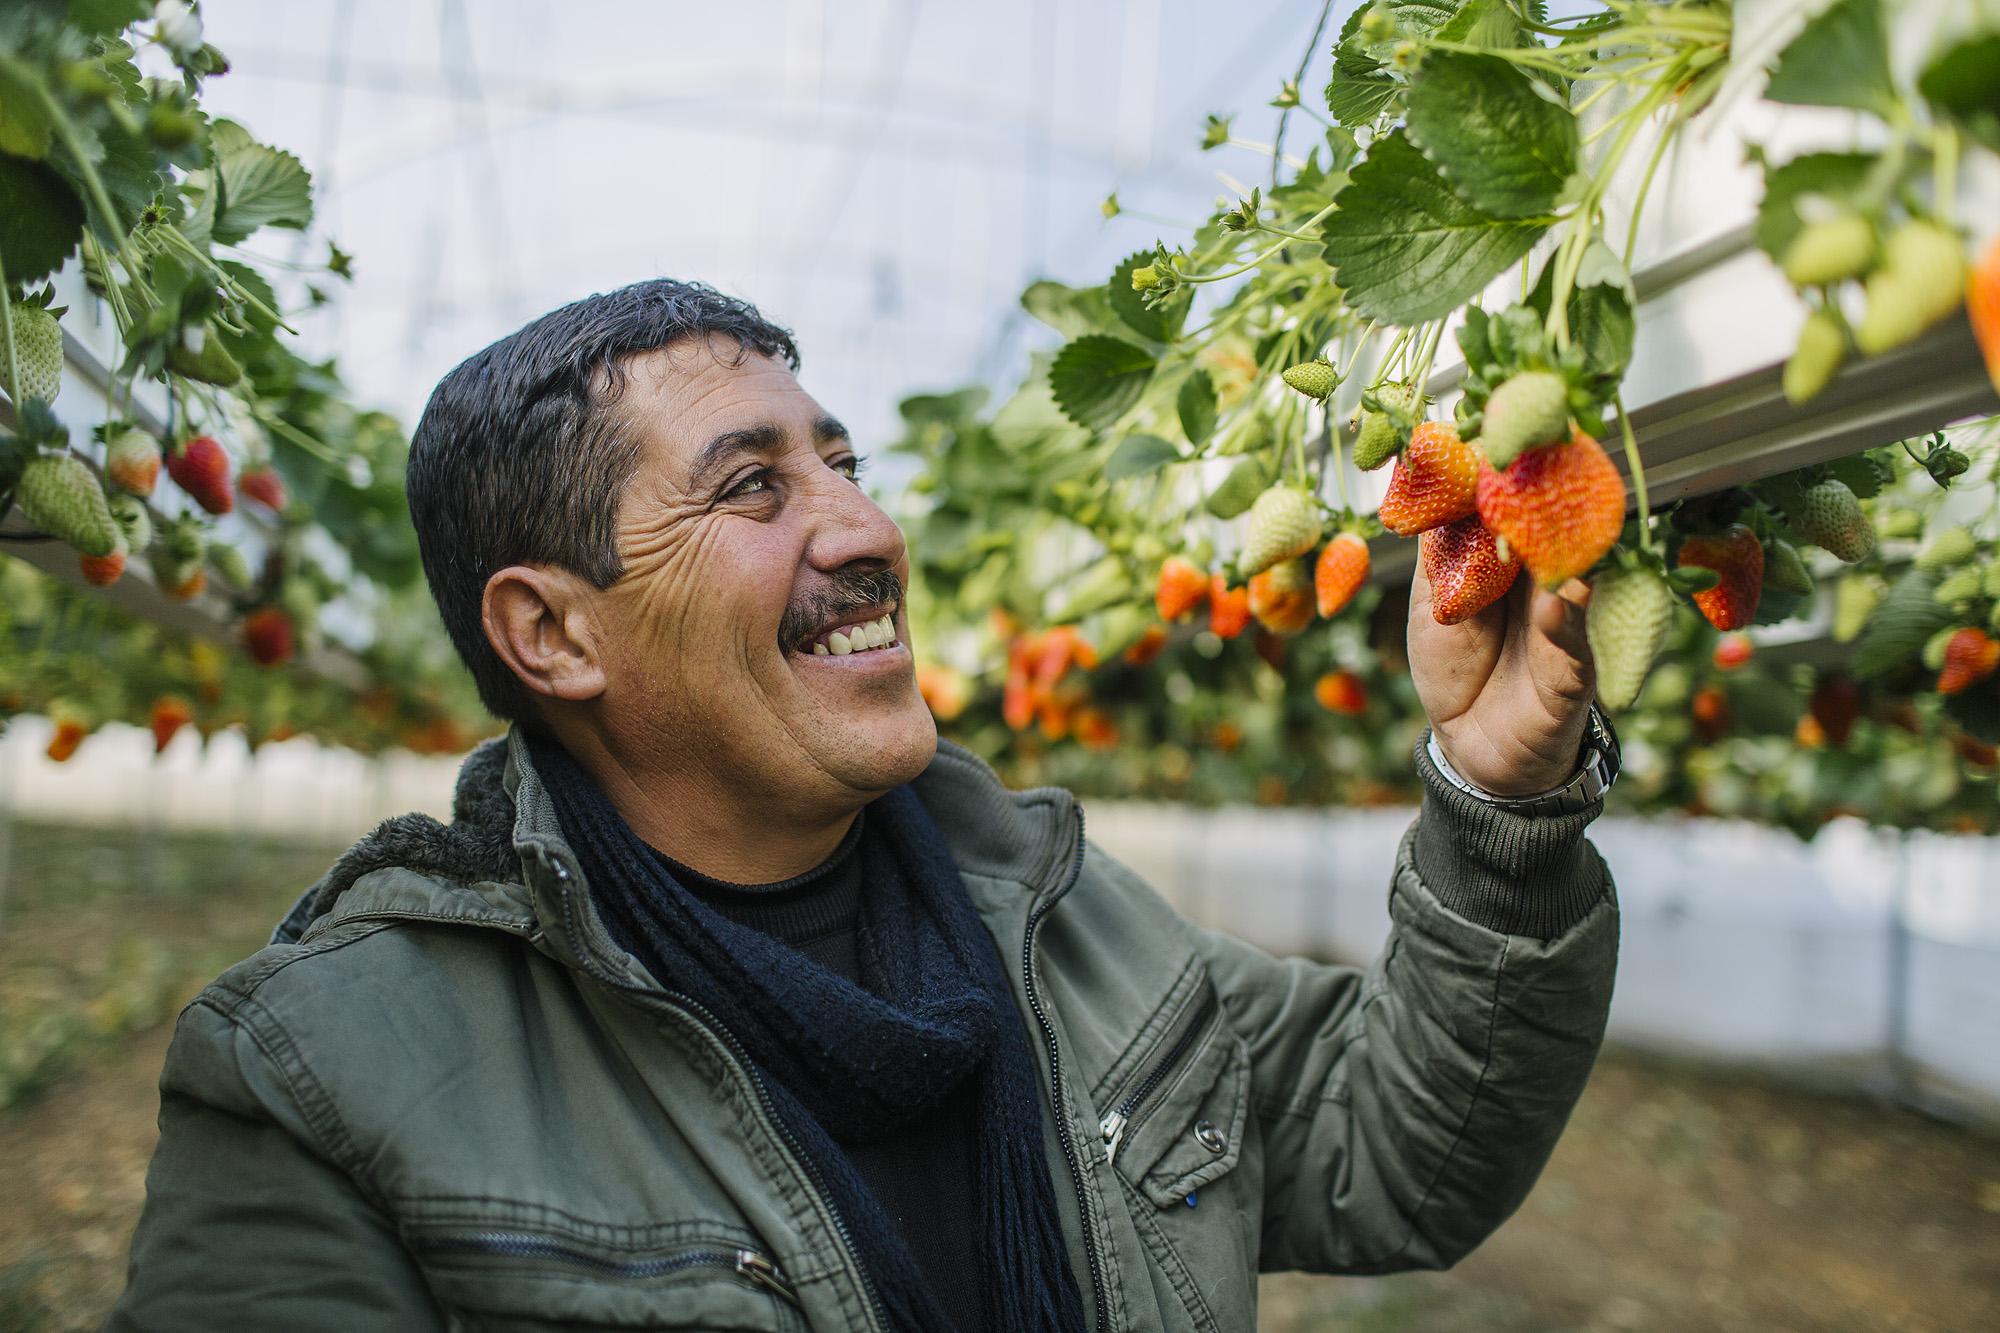 USAID-Israel-Day5-Strawberries-TD4A8112.jpg